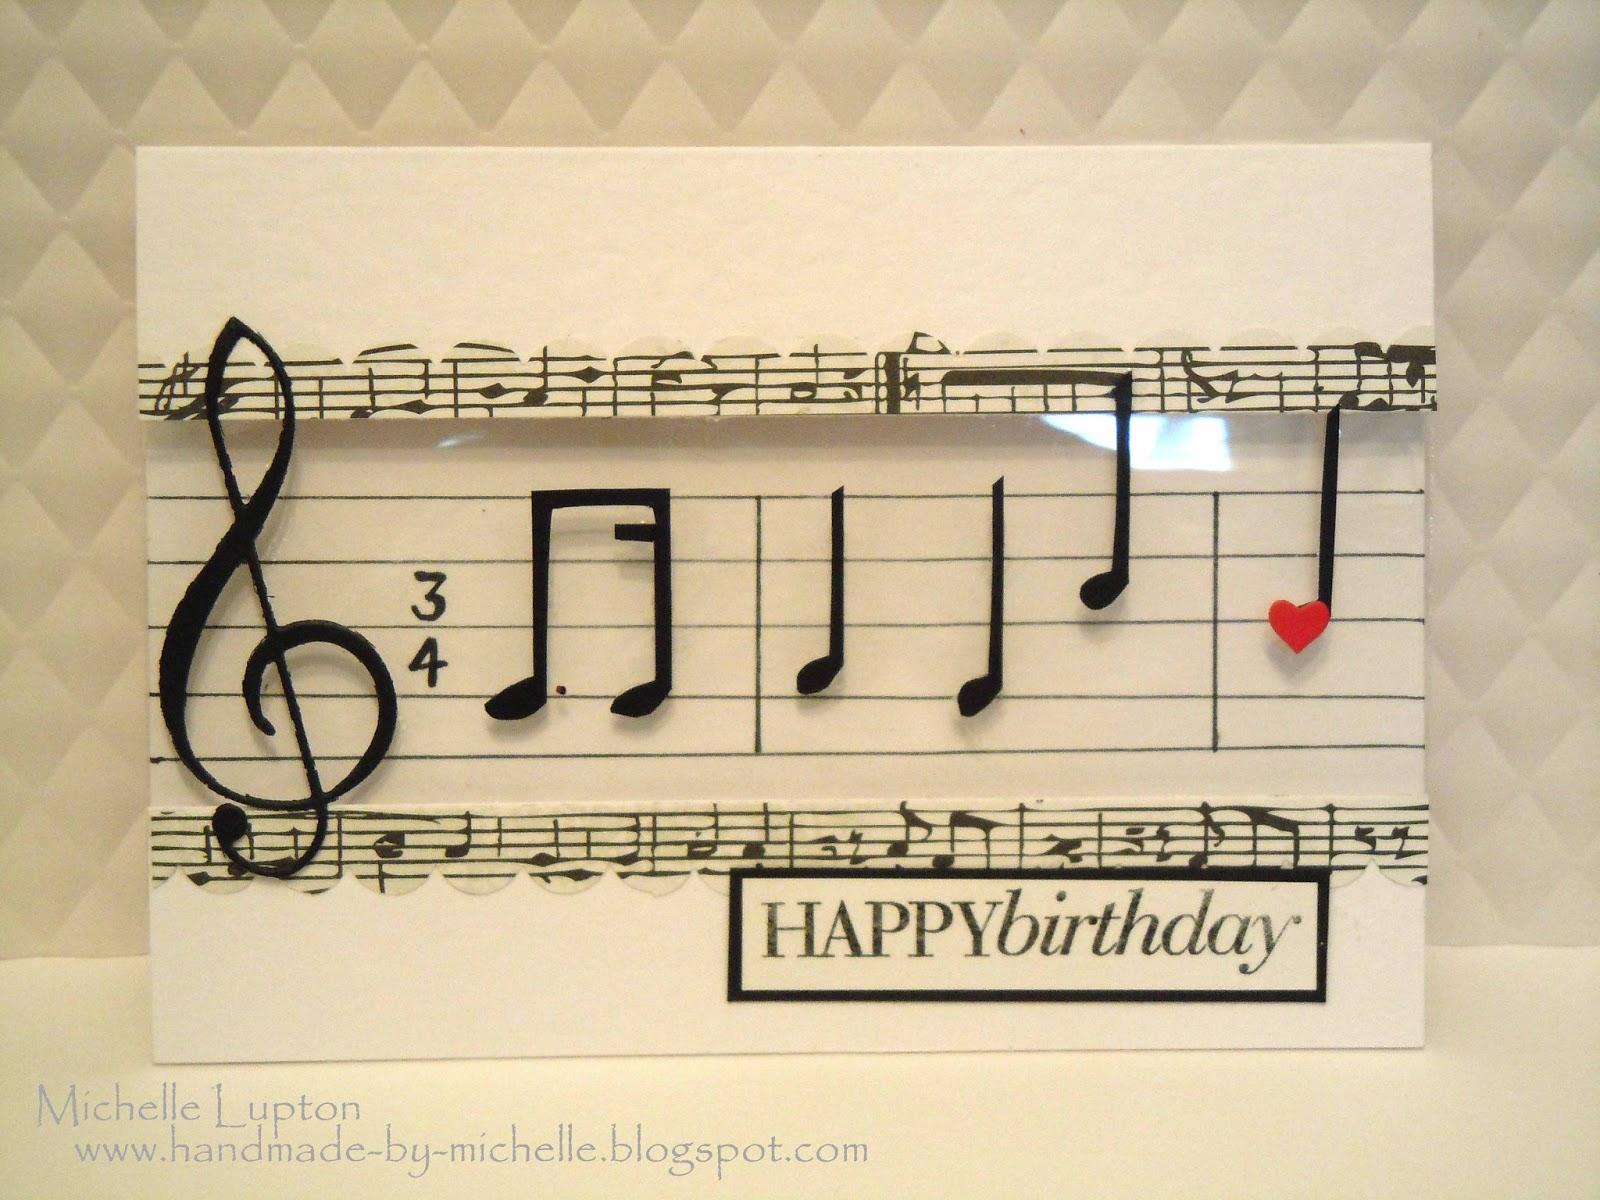 Handmade by Michelle: Musical happy birthday